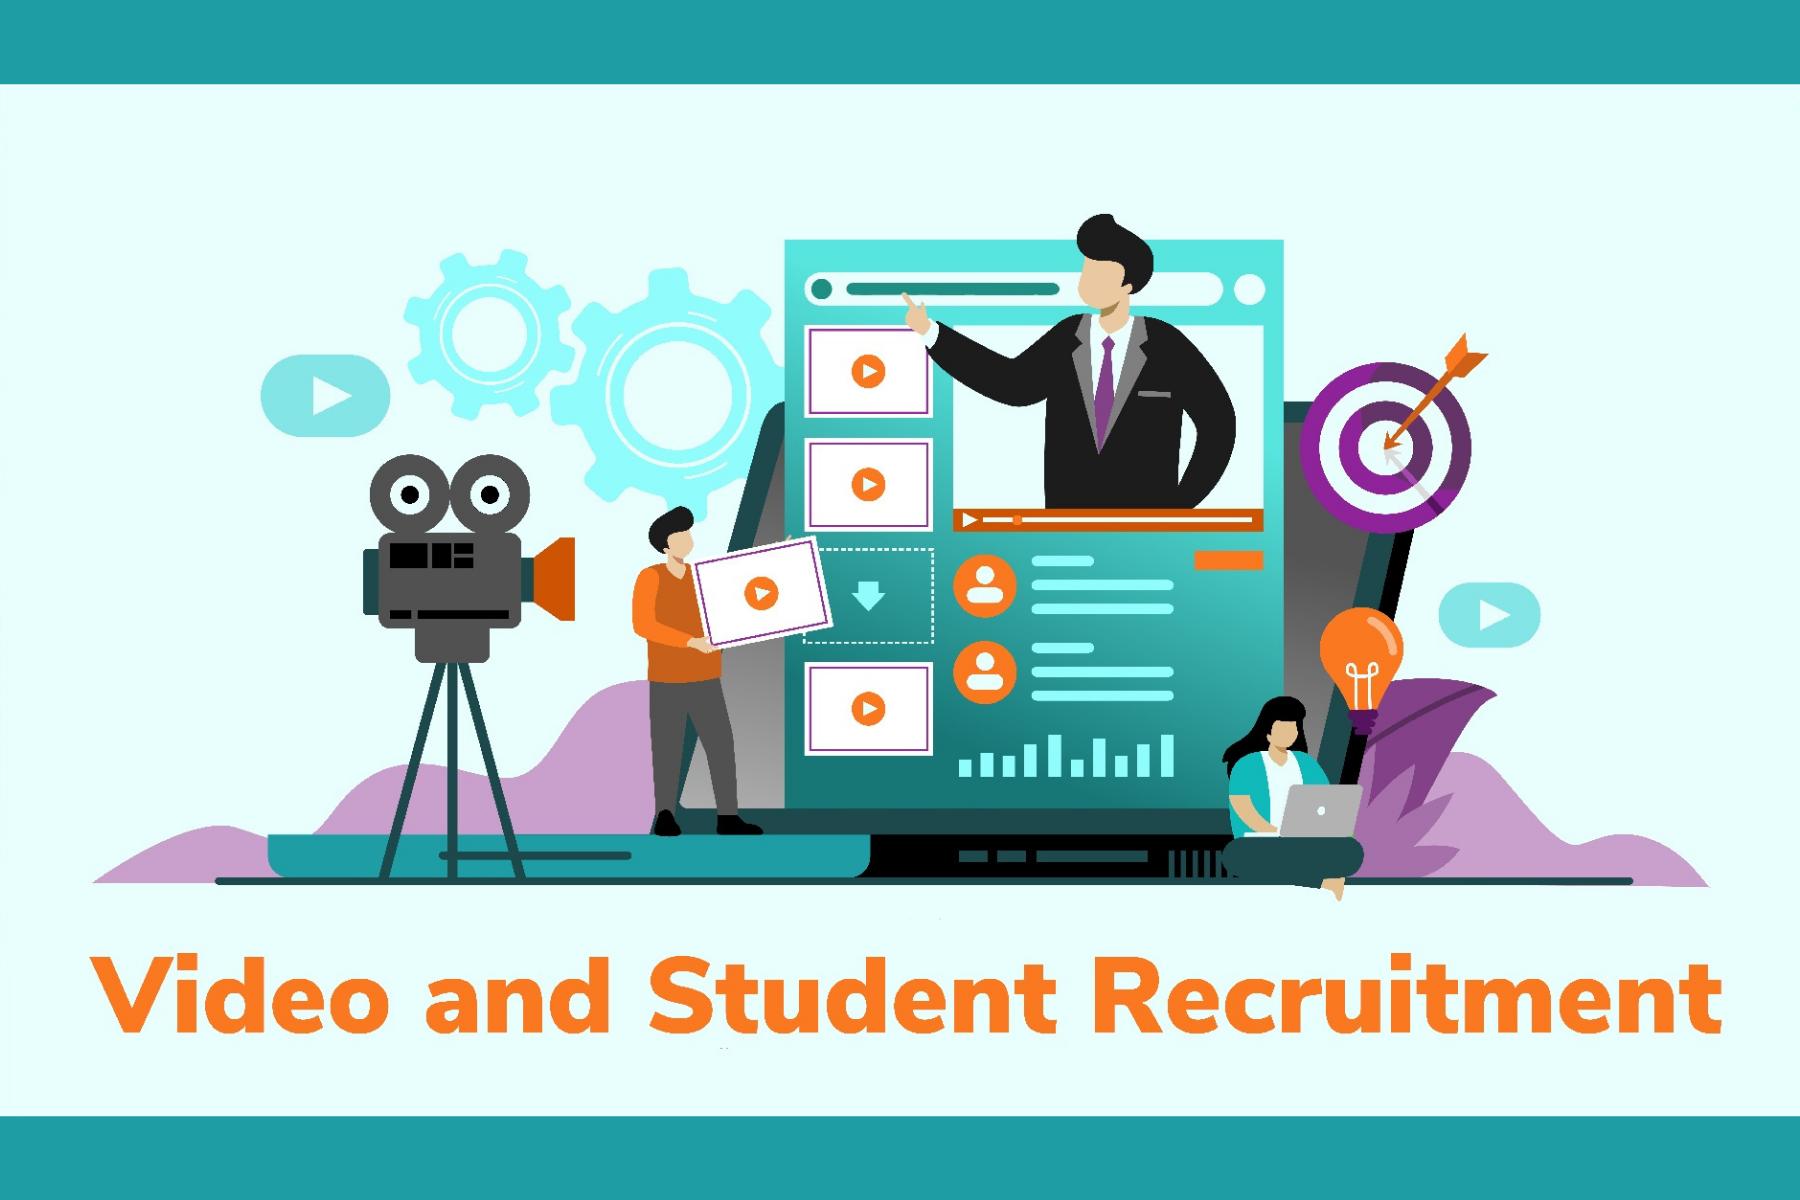 Student recruitment video